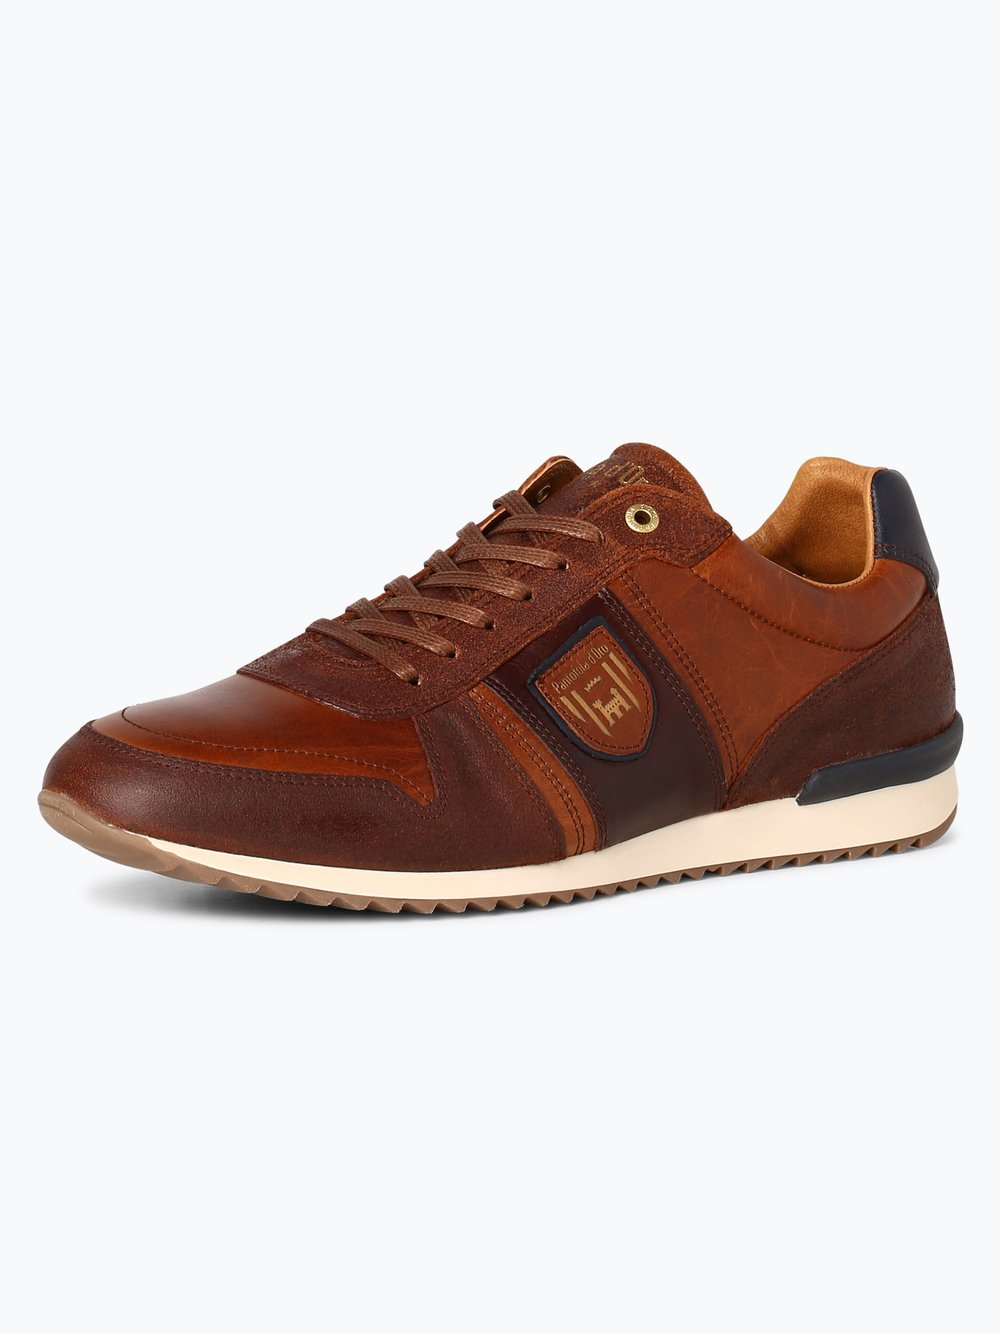 Sneaker Pantofola D`oro Uomo Low Aus Herren Online Leder Umito T1cKJ3lF